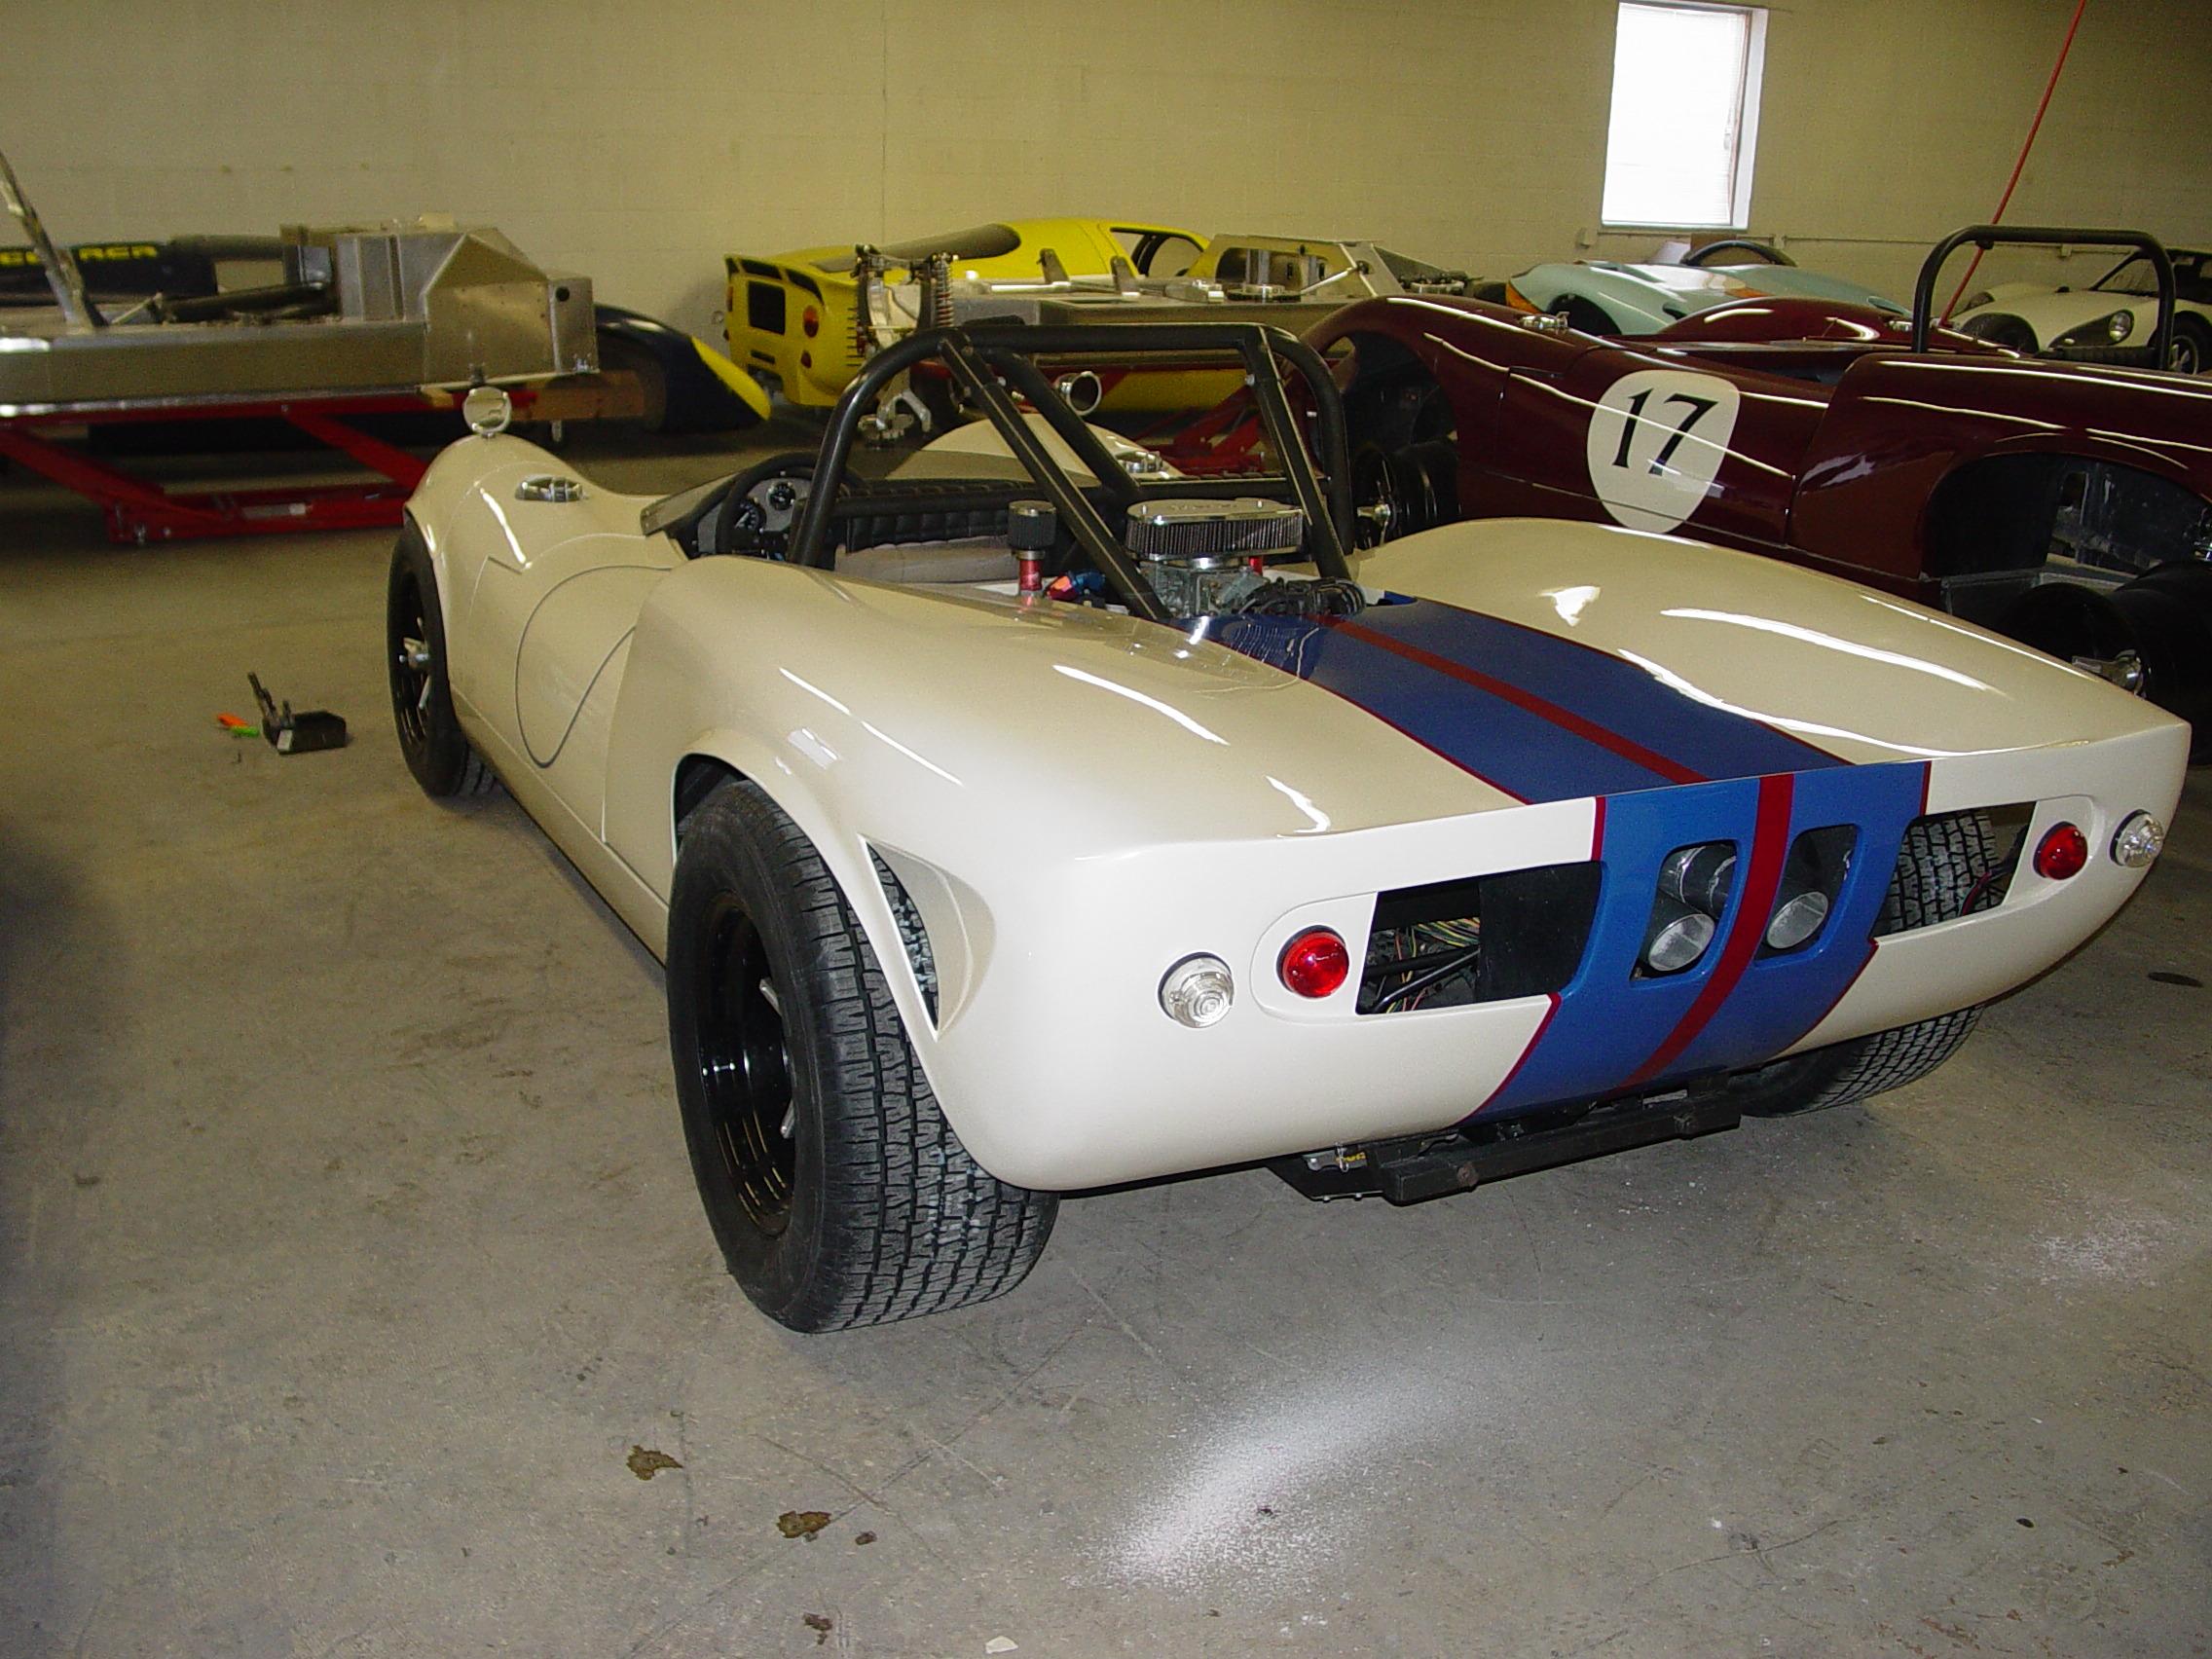 Eastons car 004.jpg